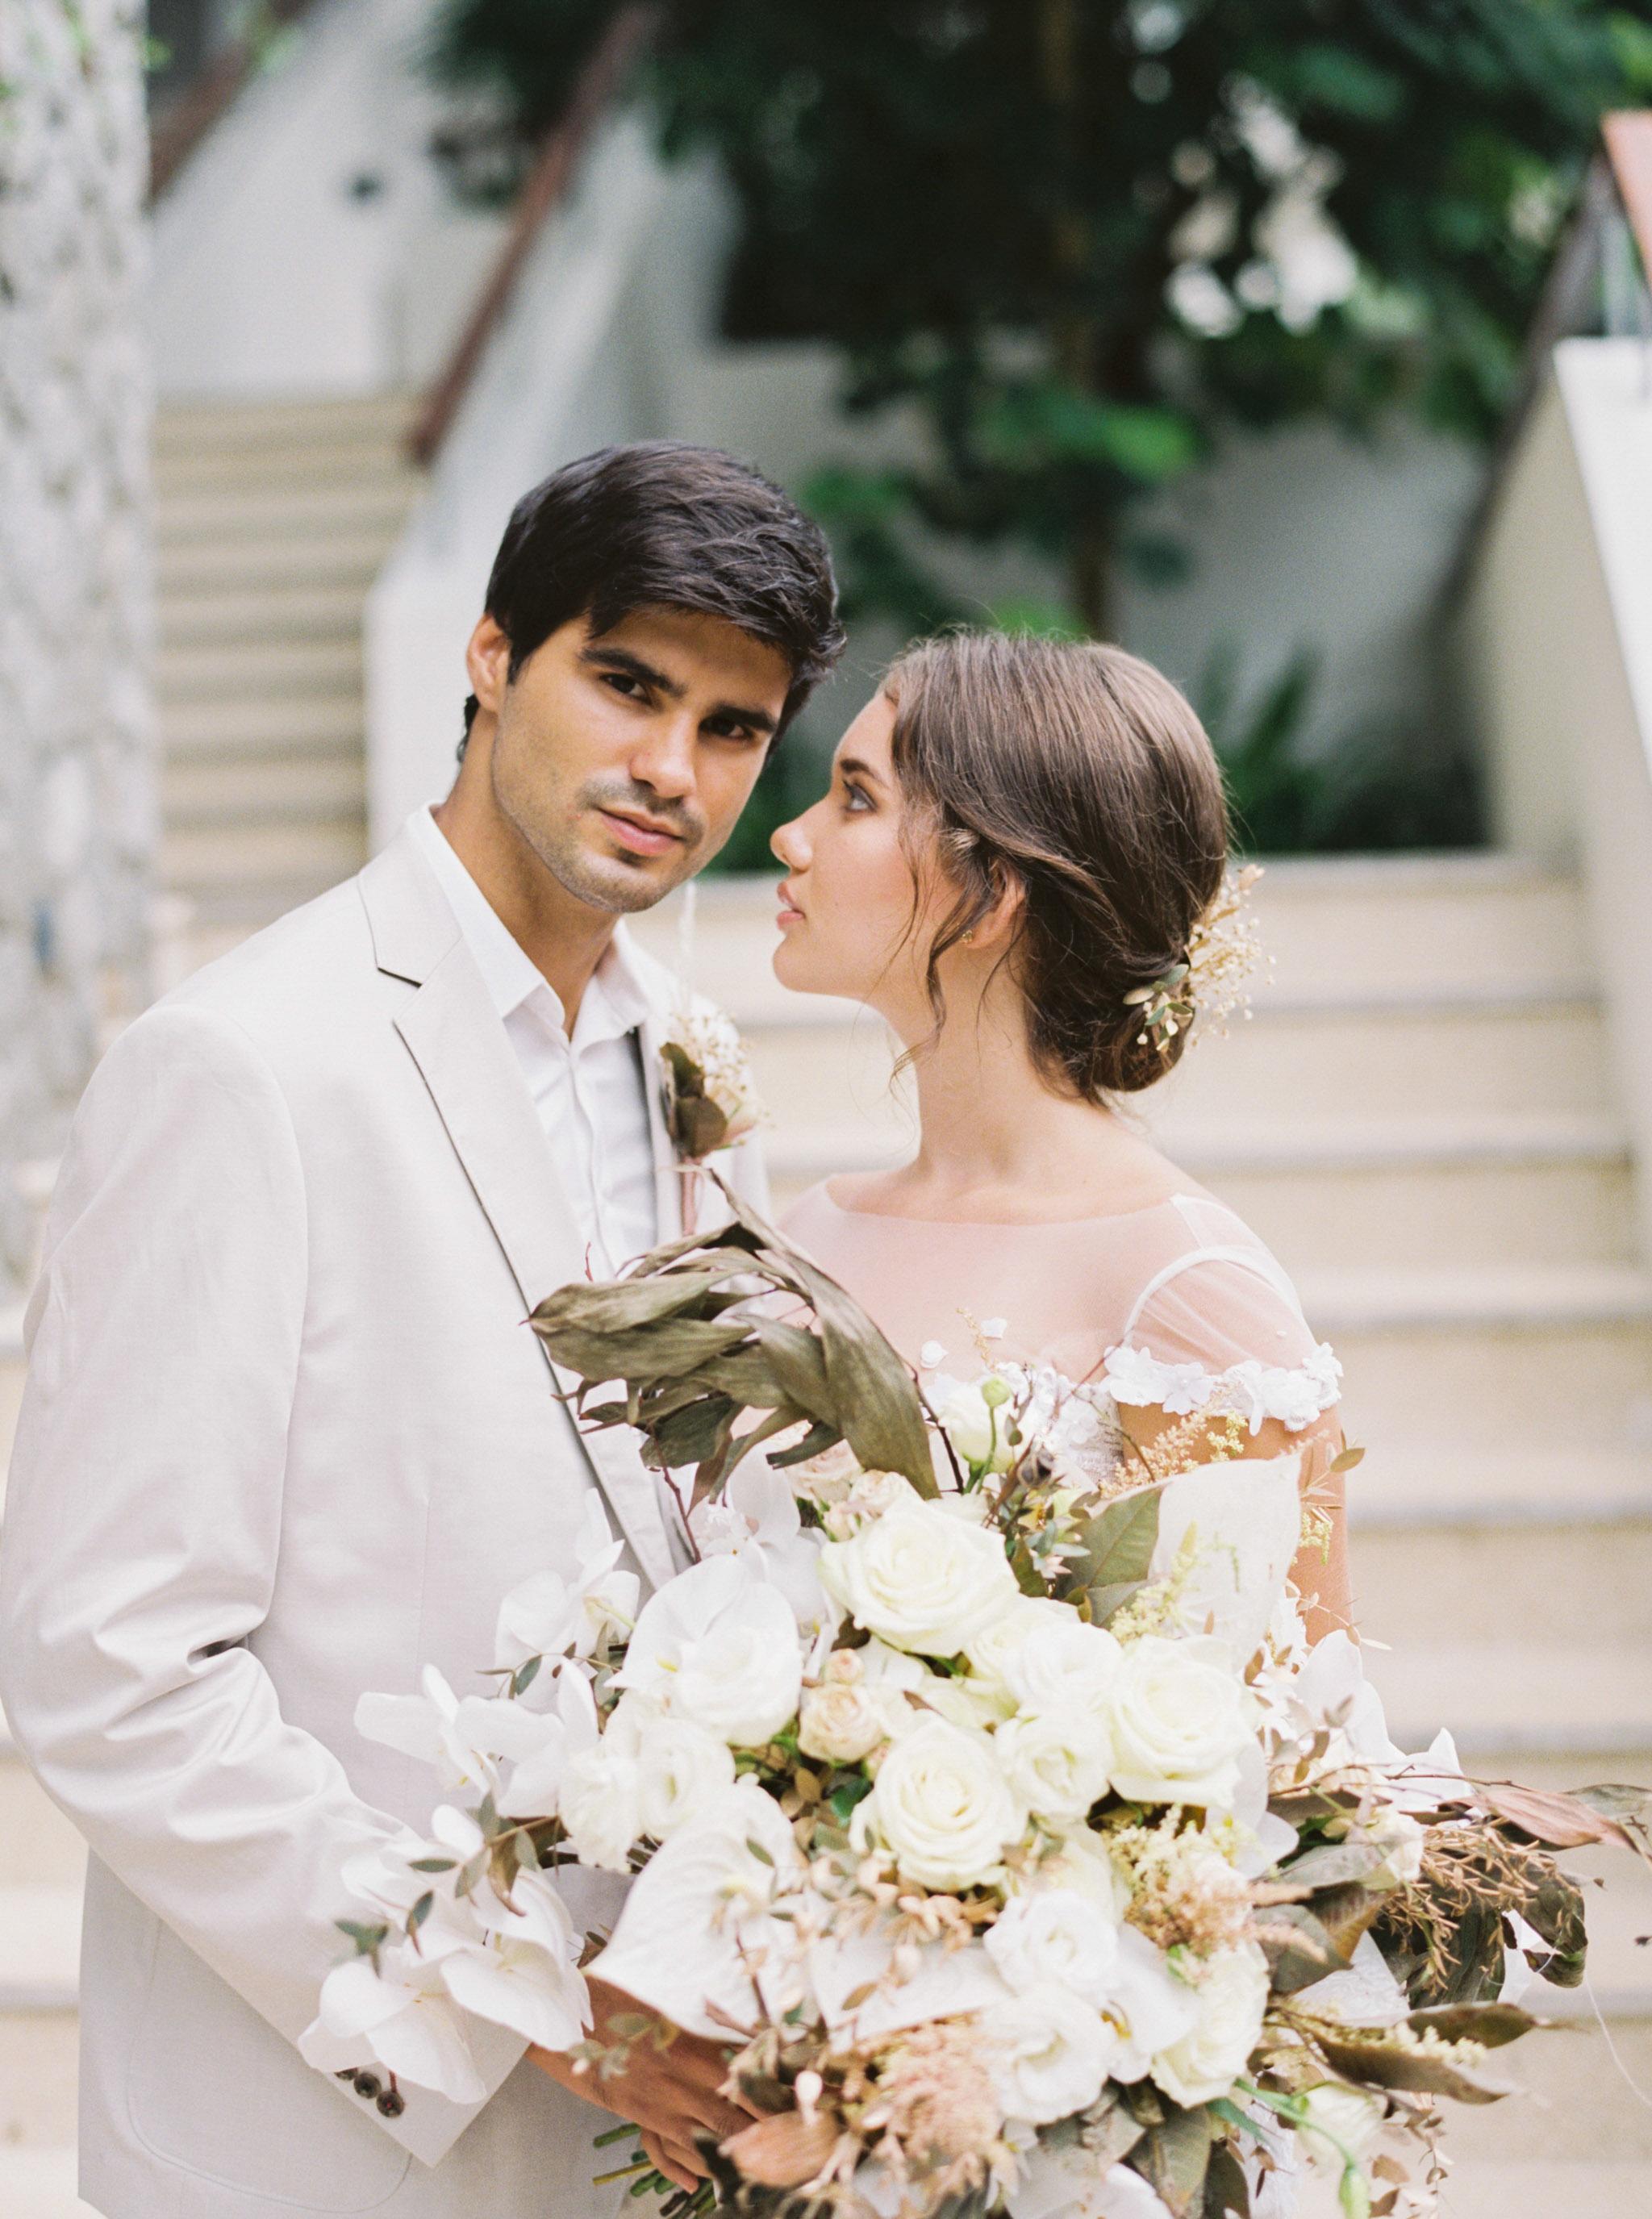 Destination Wedding at The Aquila Luxury Villas in Phuket Thailand Fine Art Film Wedding Photographer Sheri McMahon-00023-23.jpg